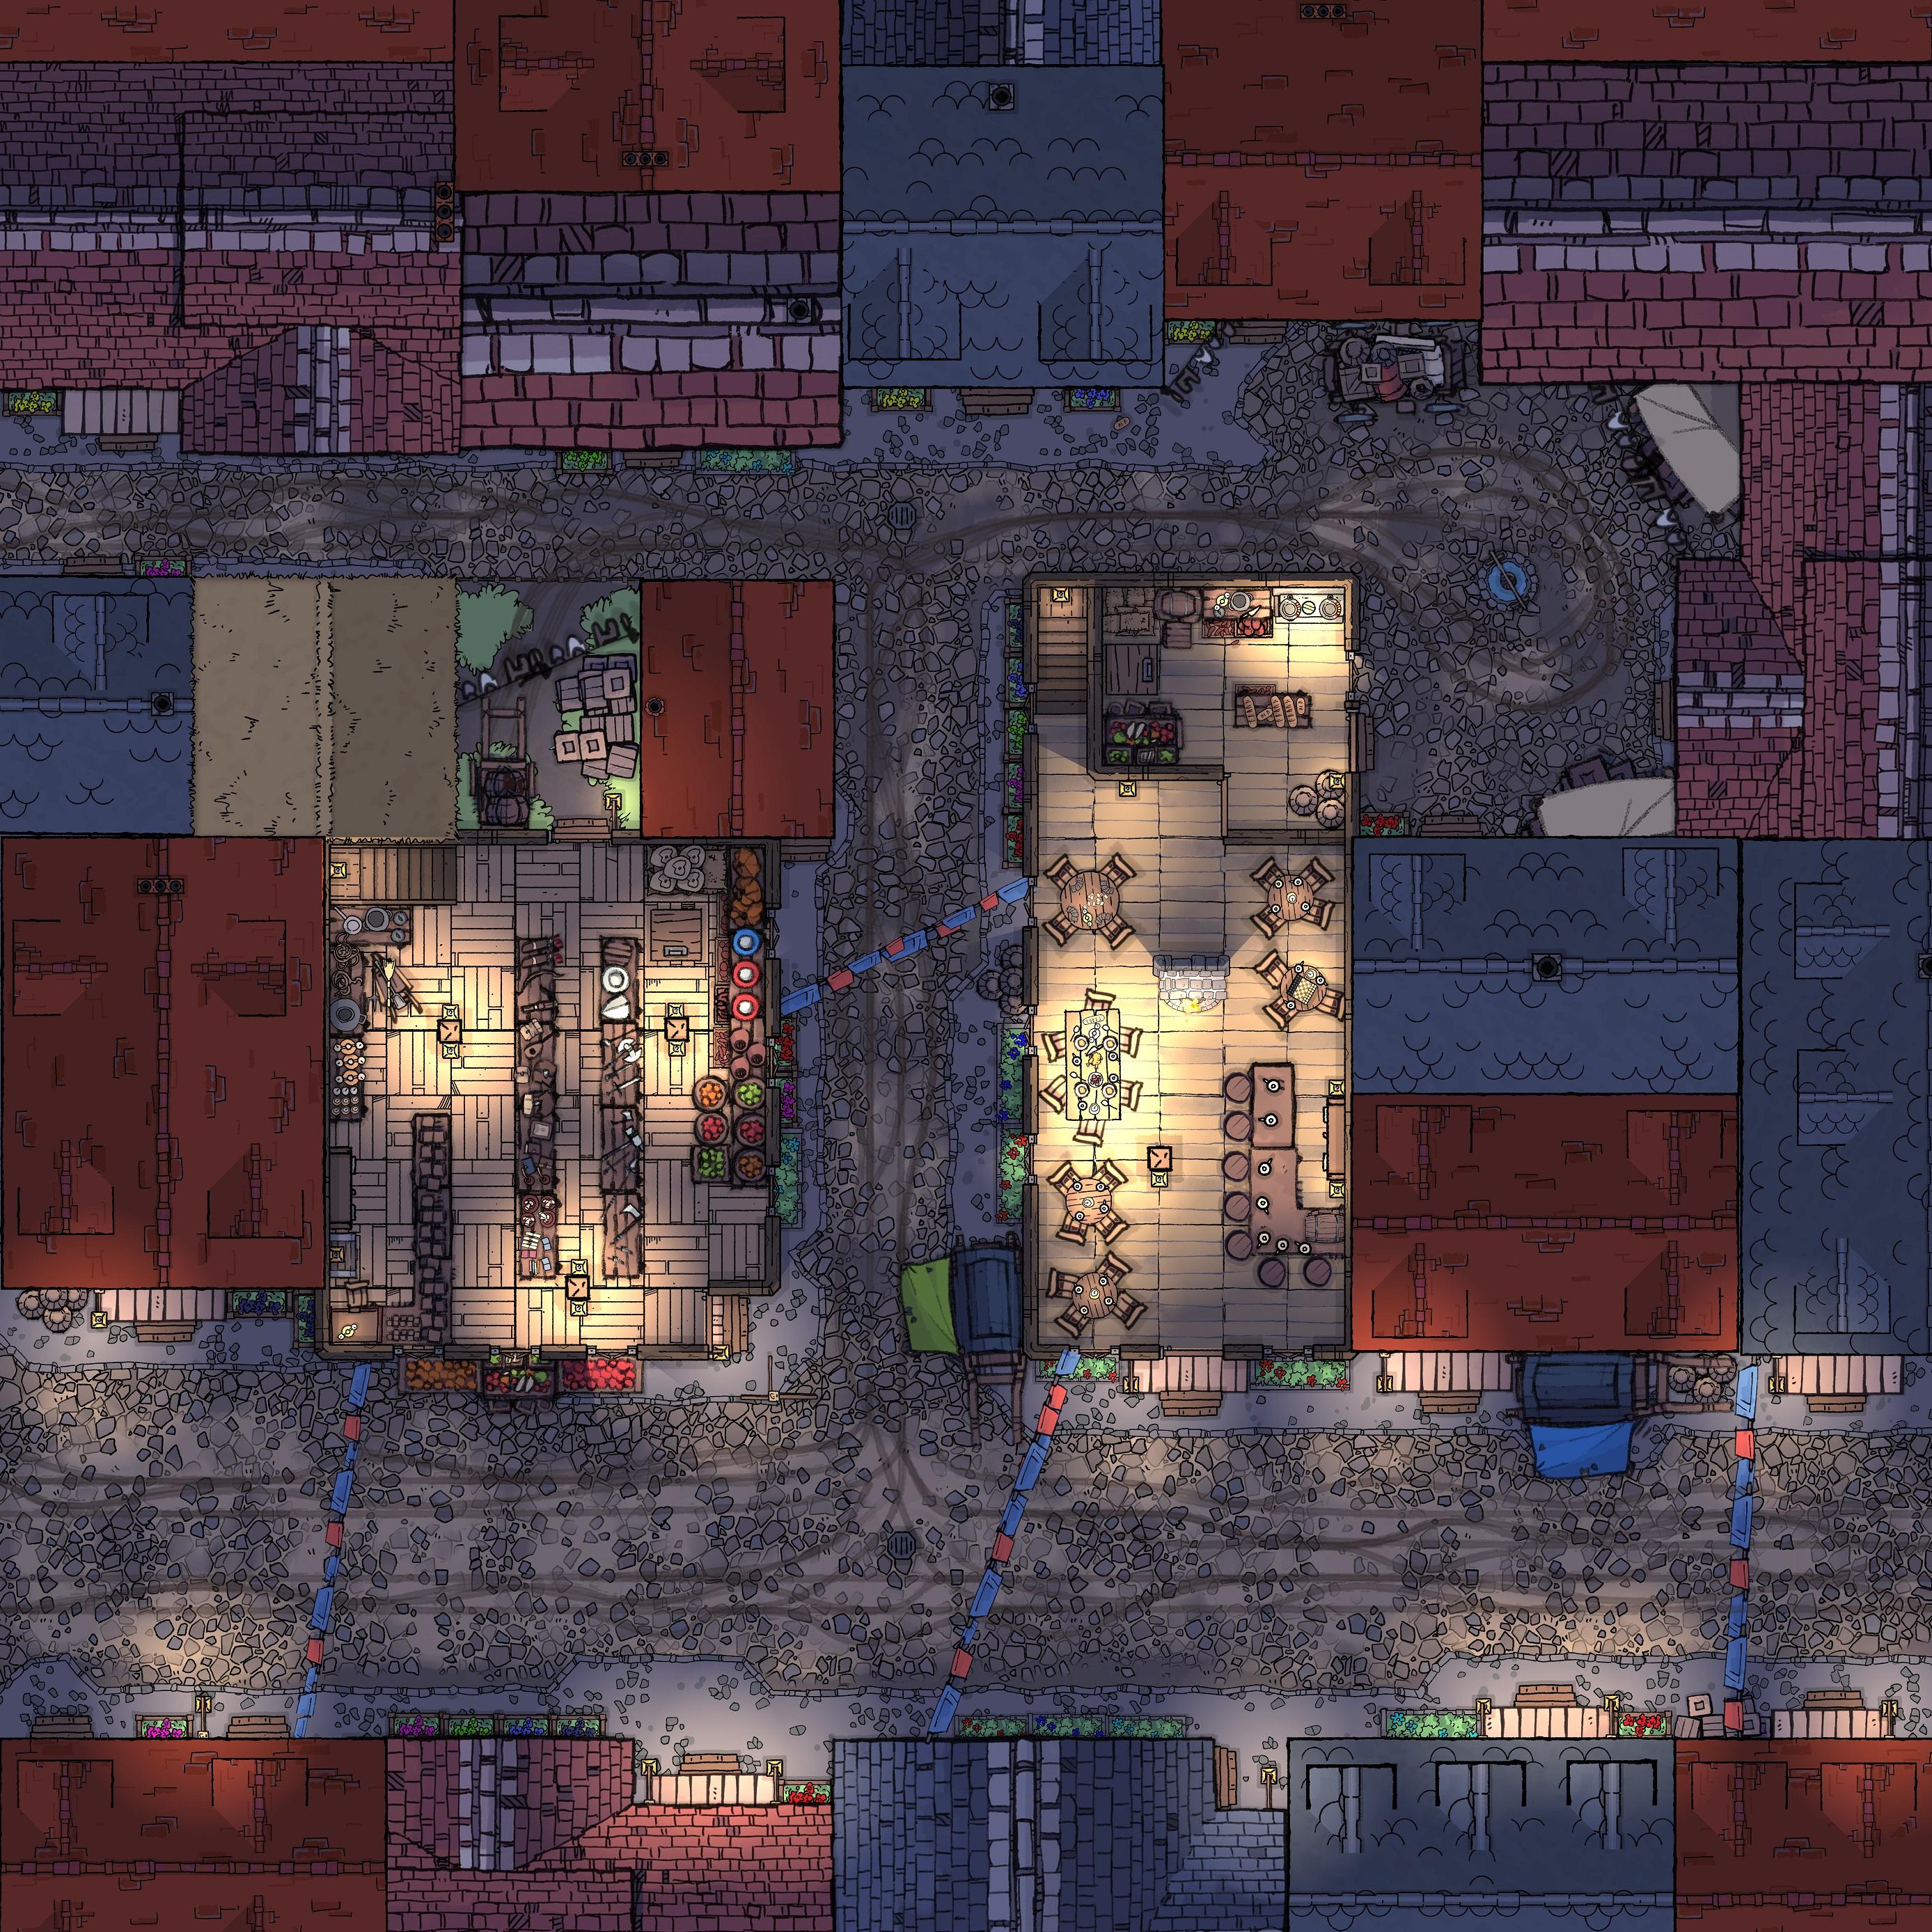 City Block night no grid 30 x 30 reduced.jpg